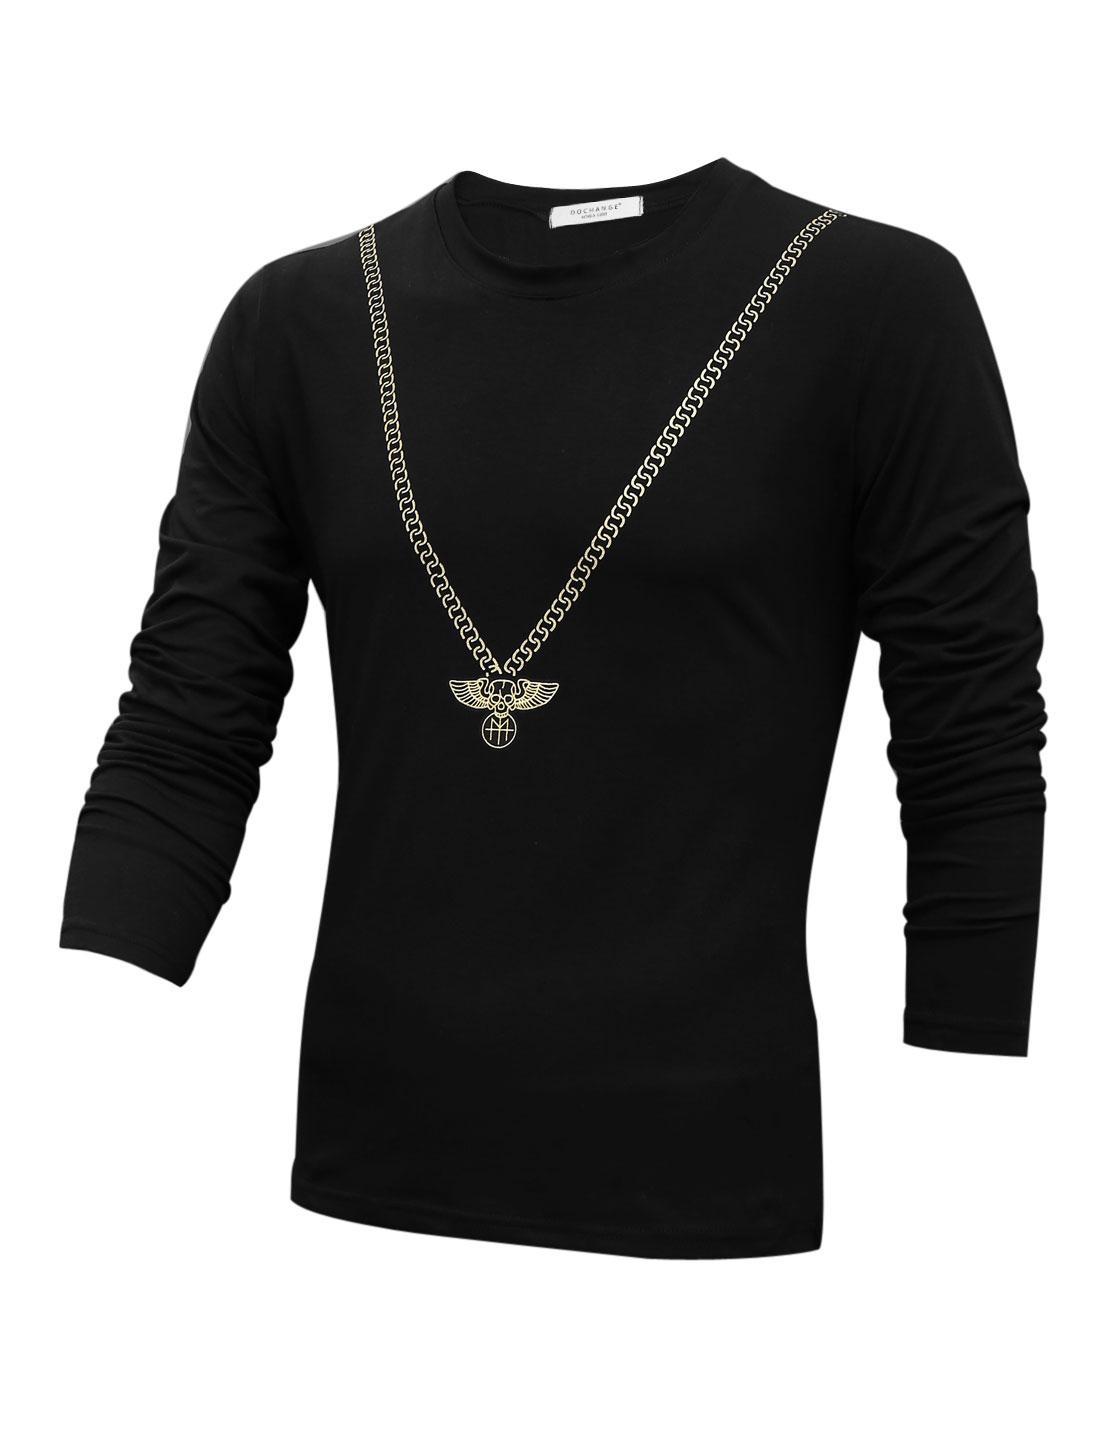 Cozy Fit Round Neck Soft Stylish Shirt for Men Black M